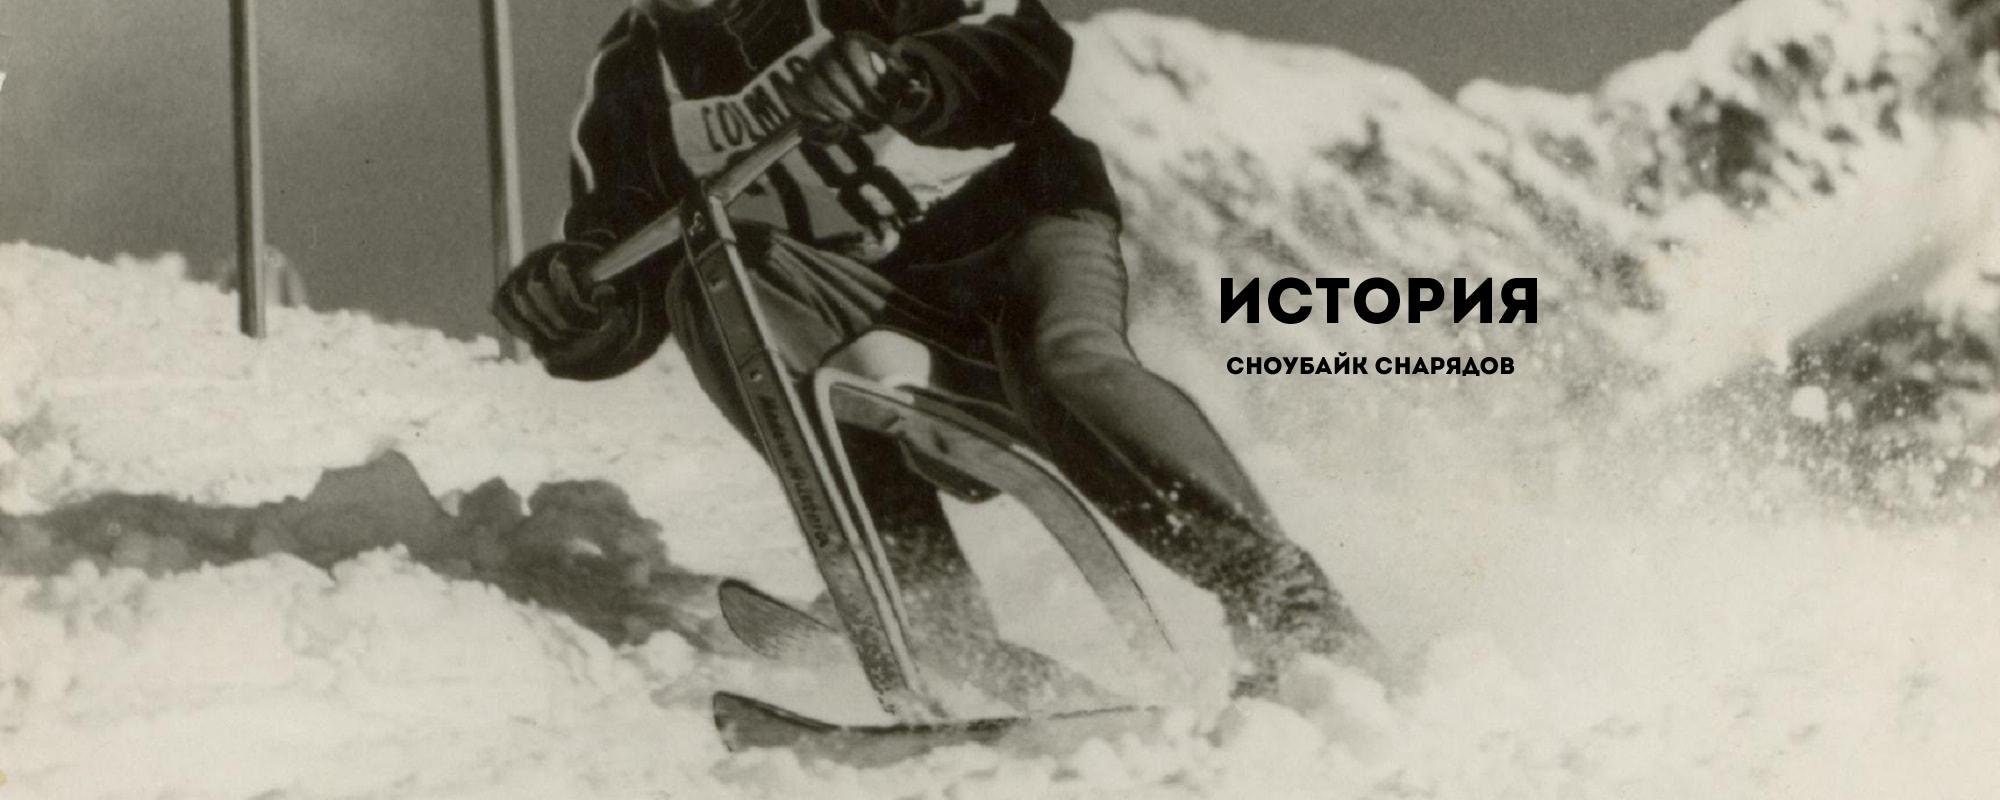 Snowbike-history_3